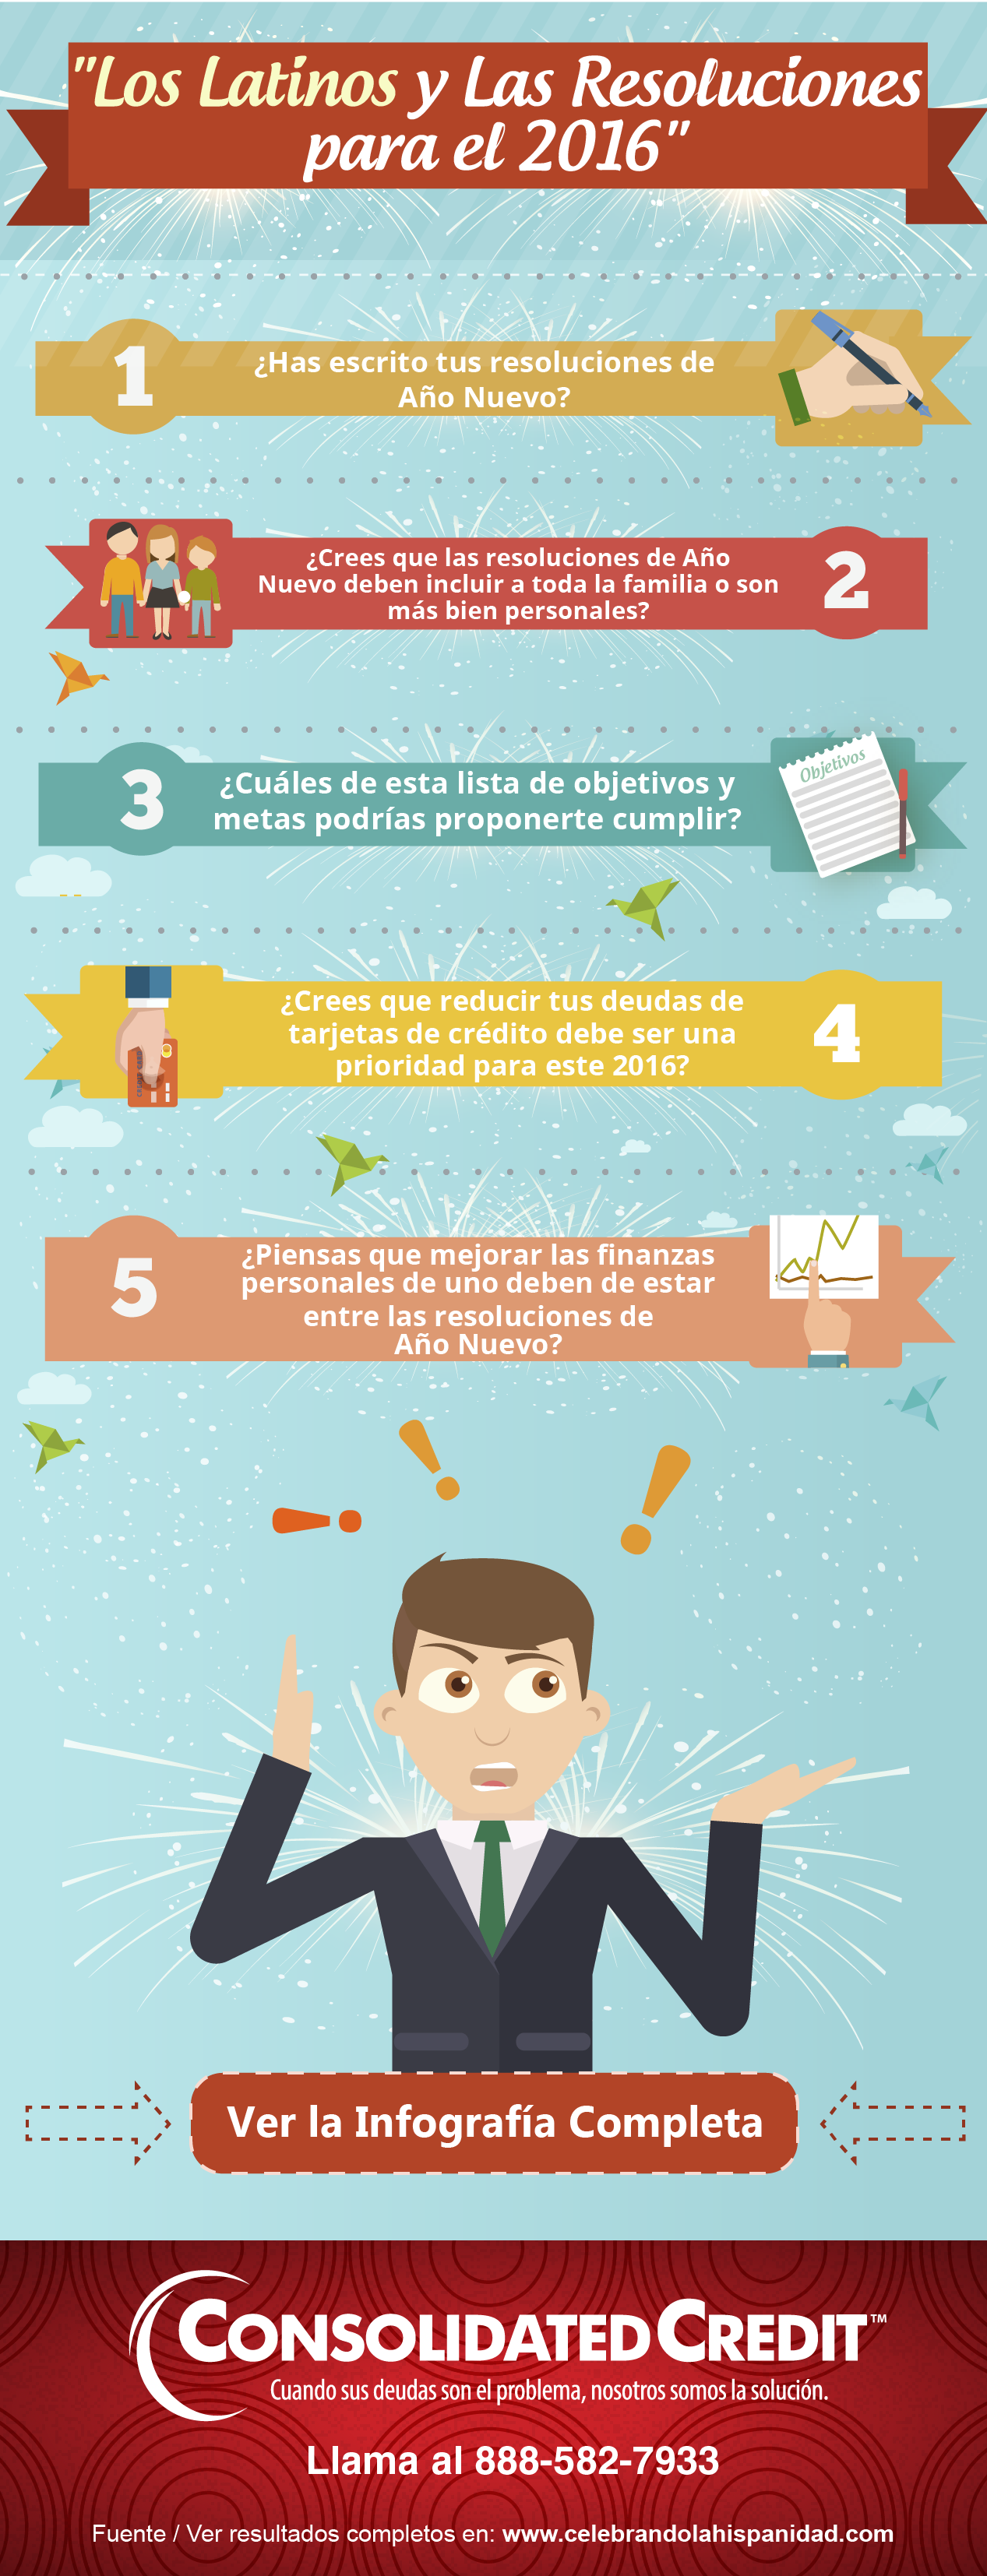 Infografia-Latinos_Resoluciones_2016-650px-ancho